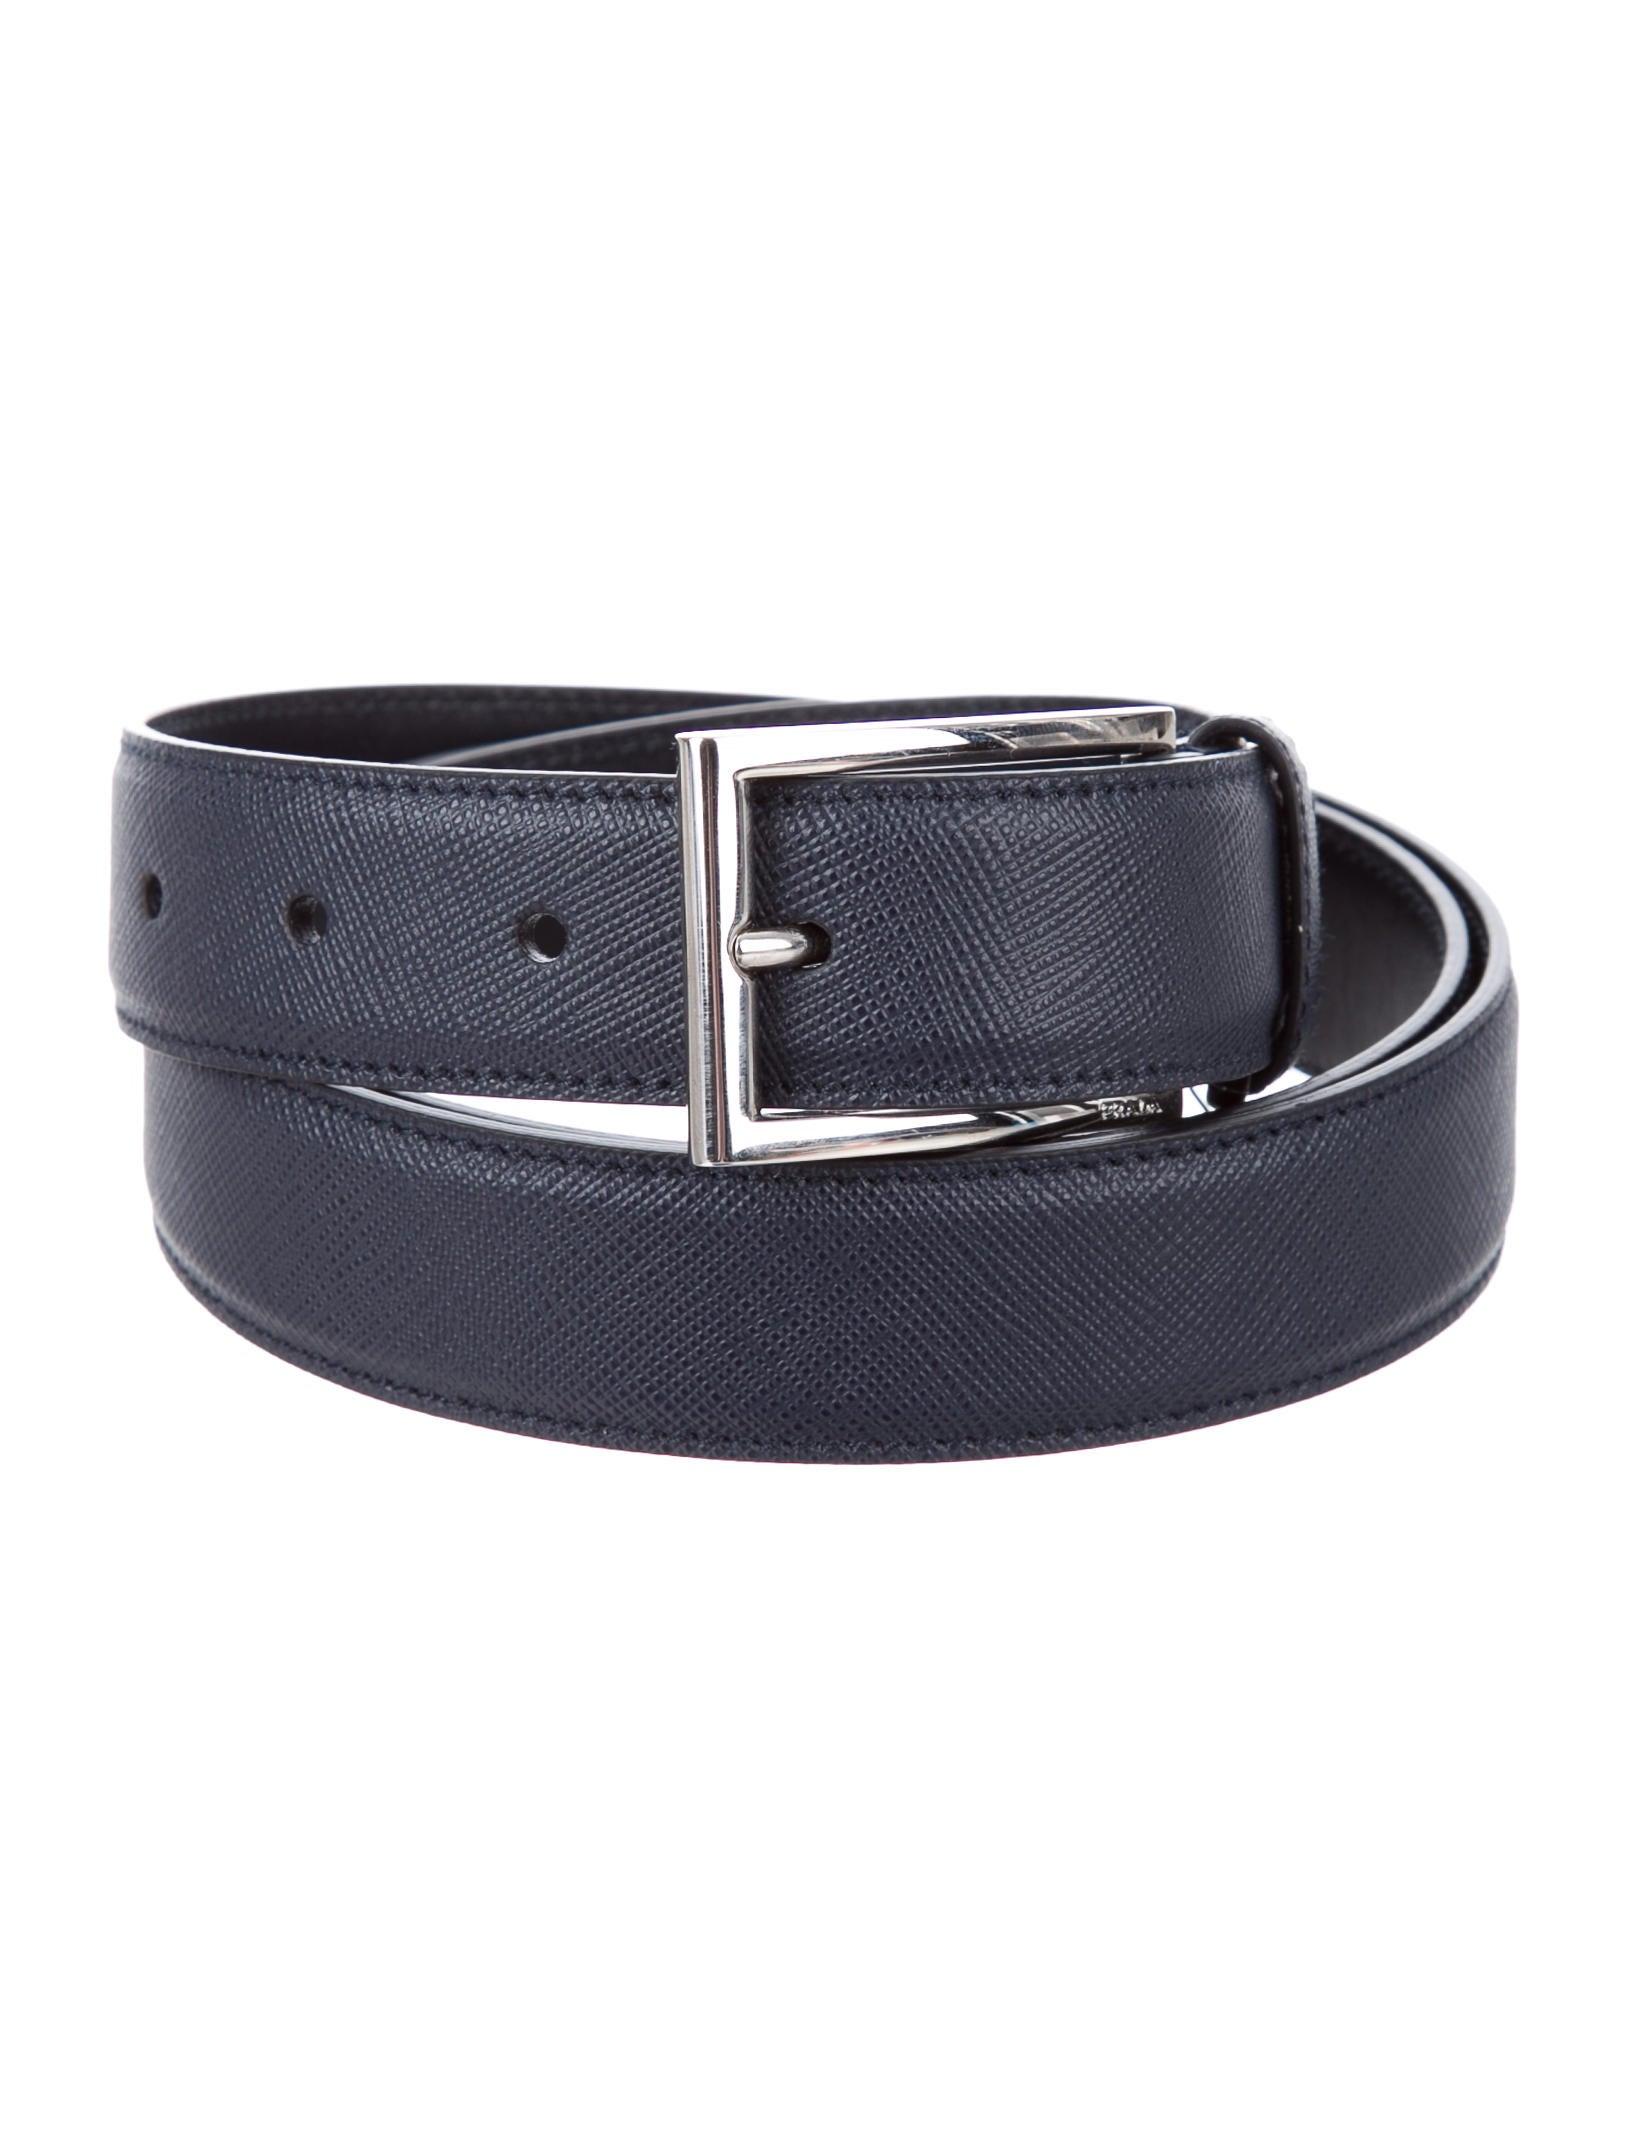 prada saffiano leather belt w tags accessories